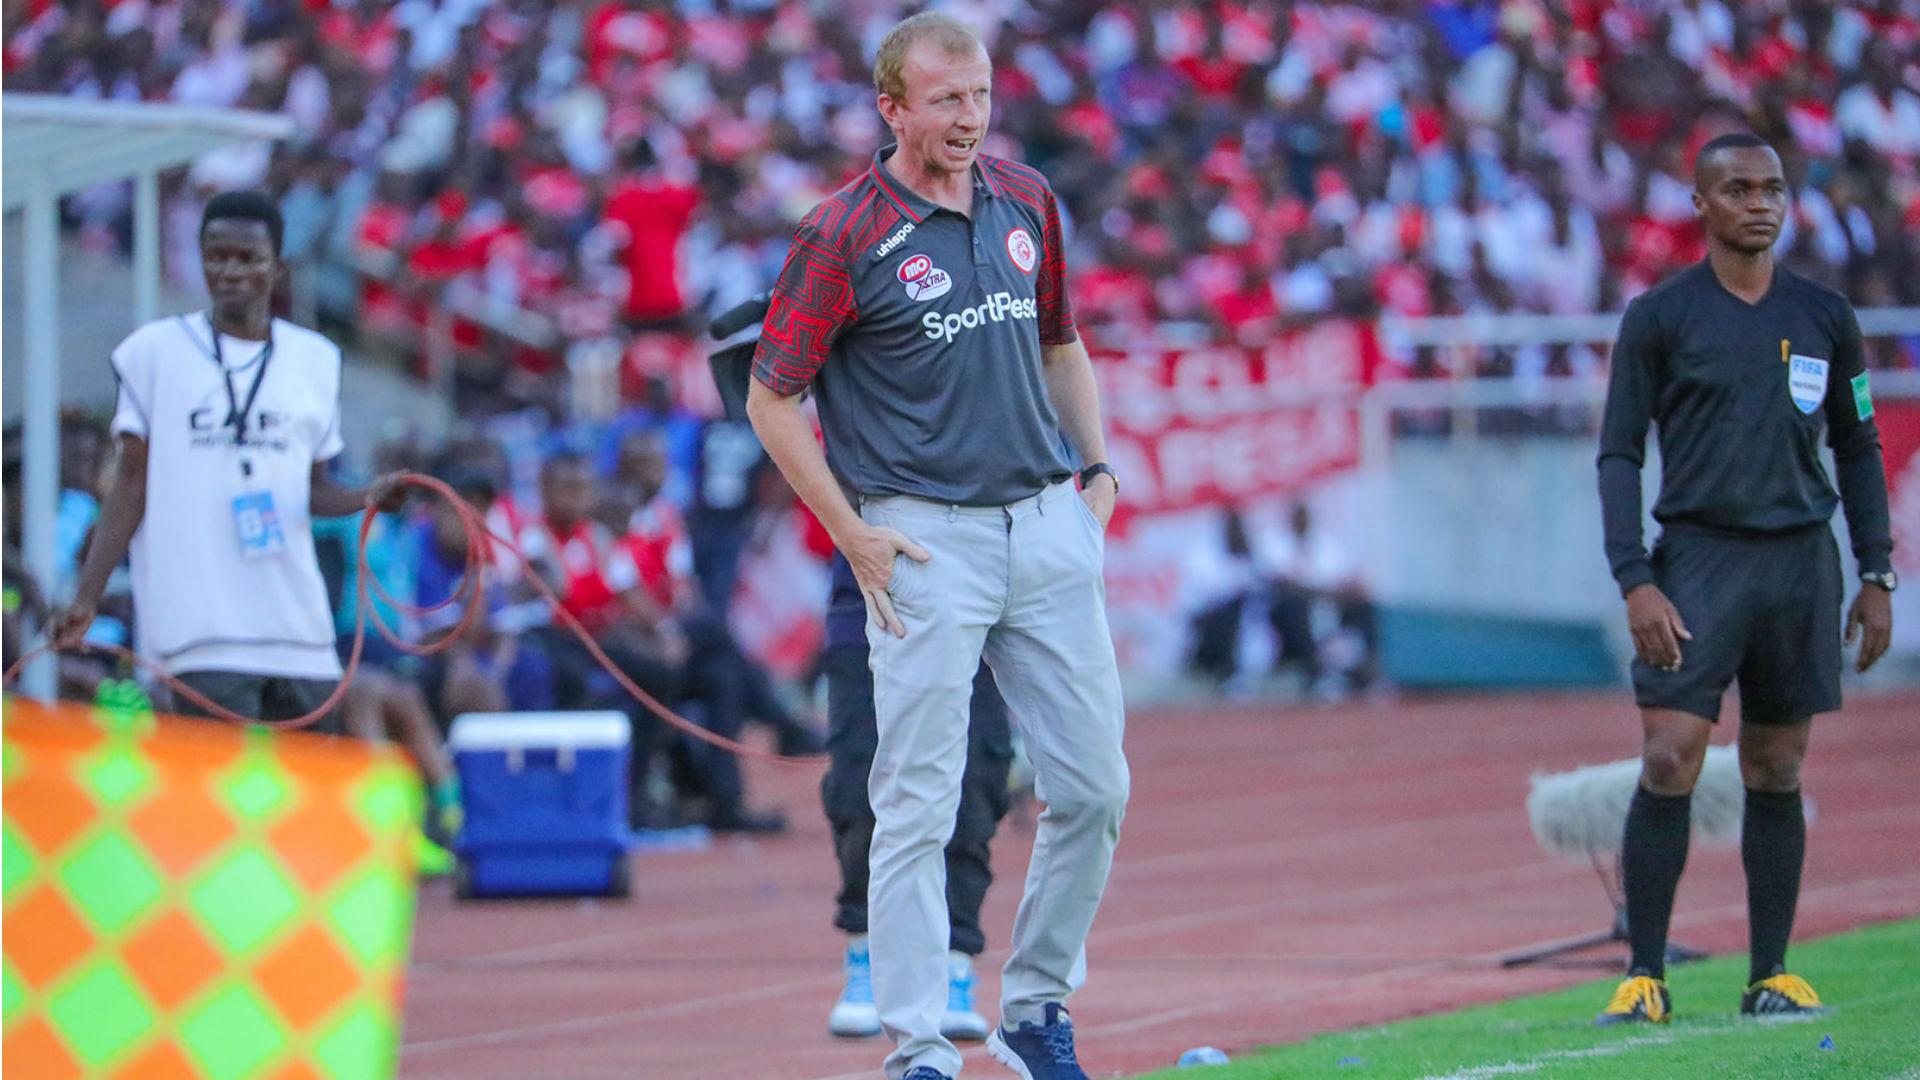 Caf CL: Simba SC coach Vandenbroeck reveals plans to beat Plateau United